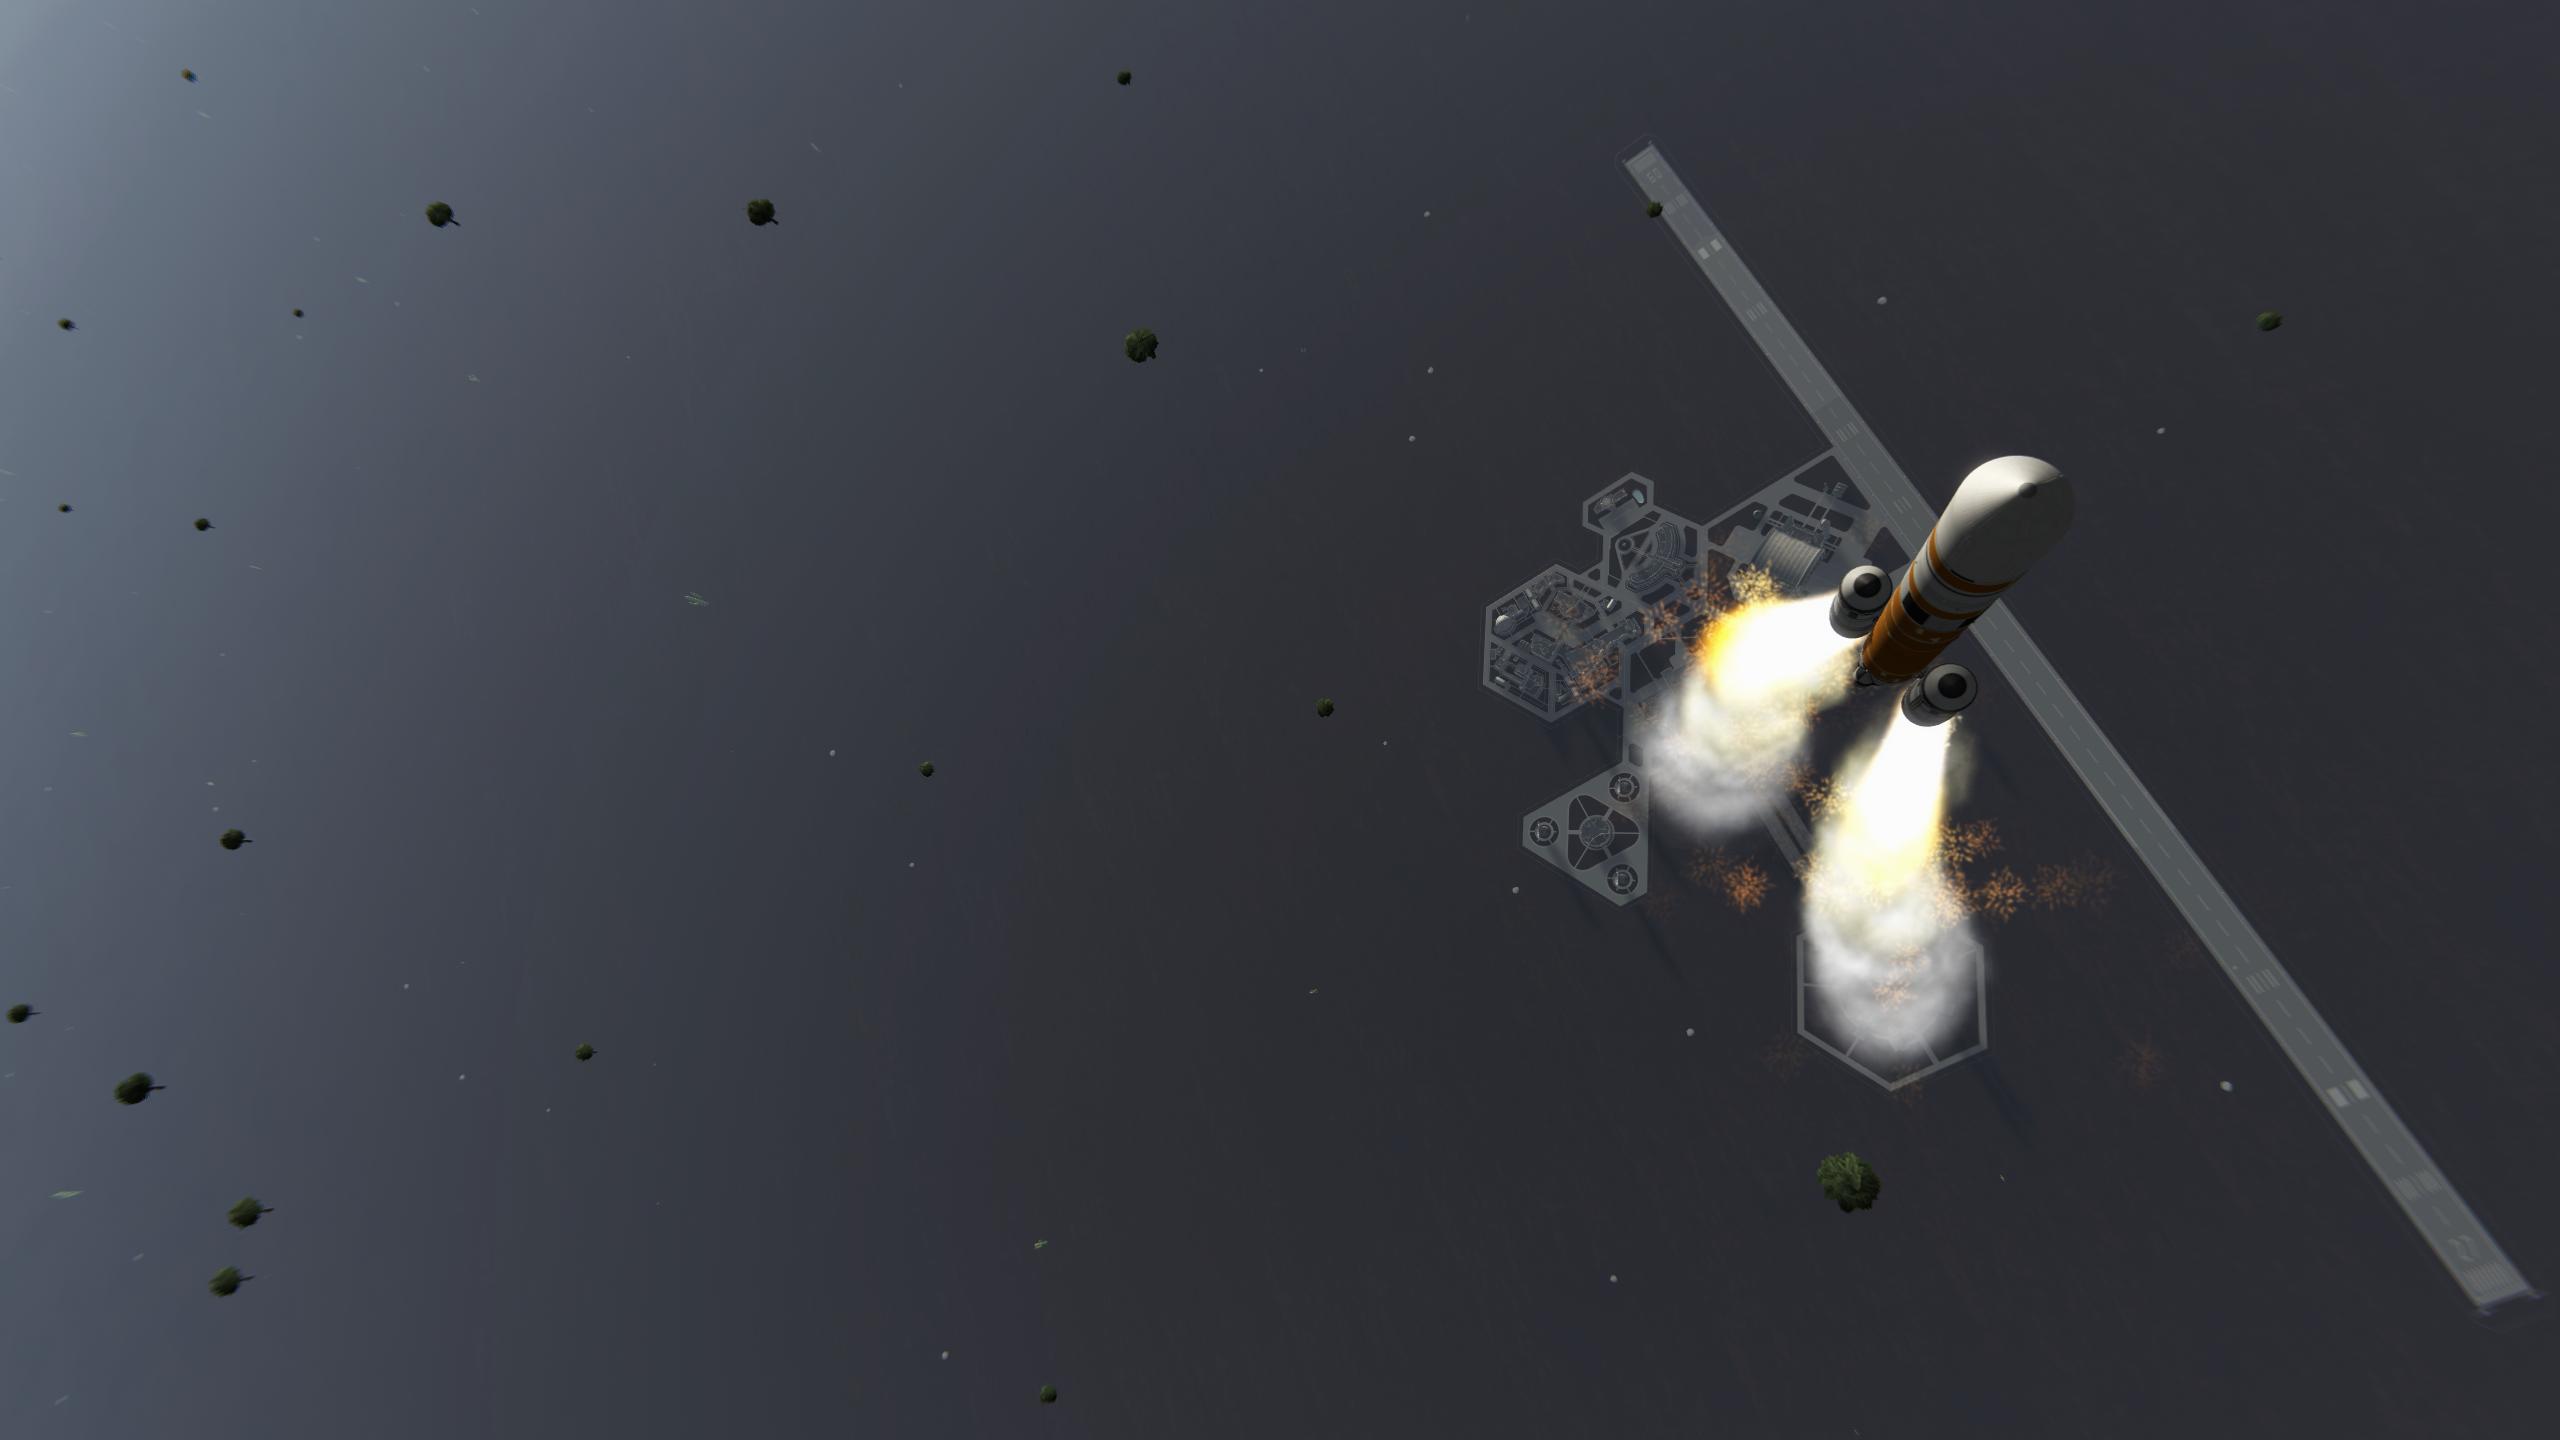 screenshot123.png